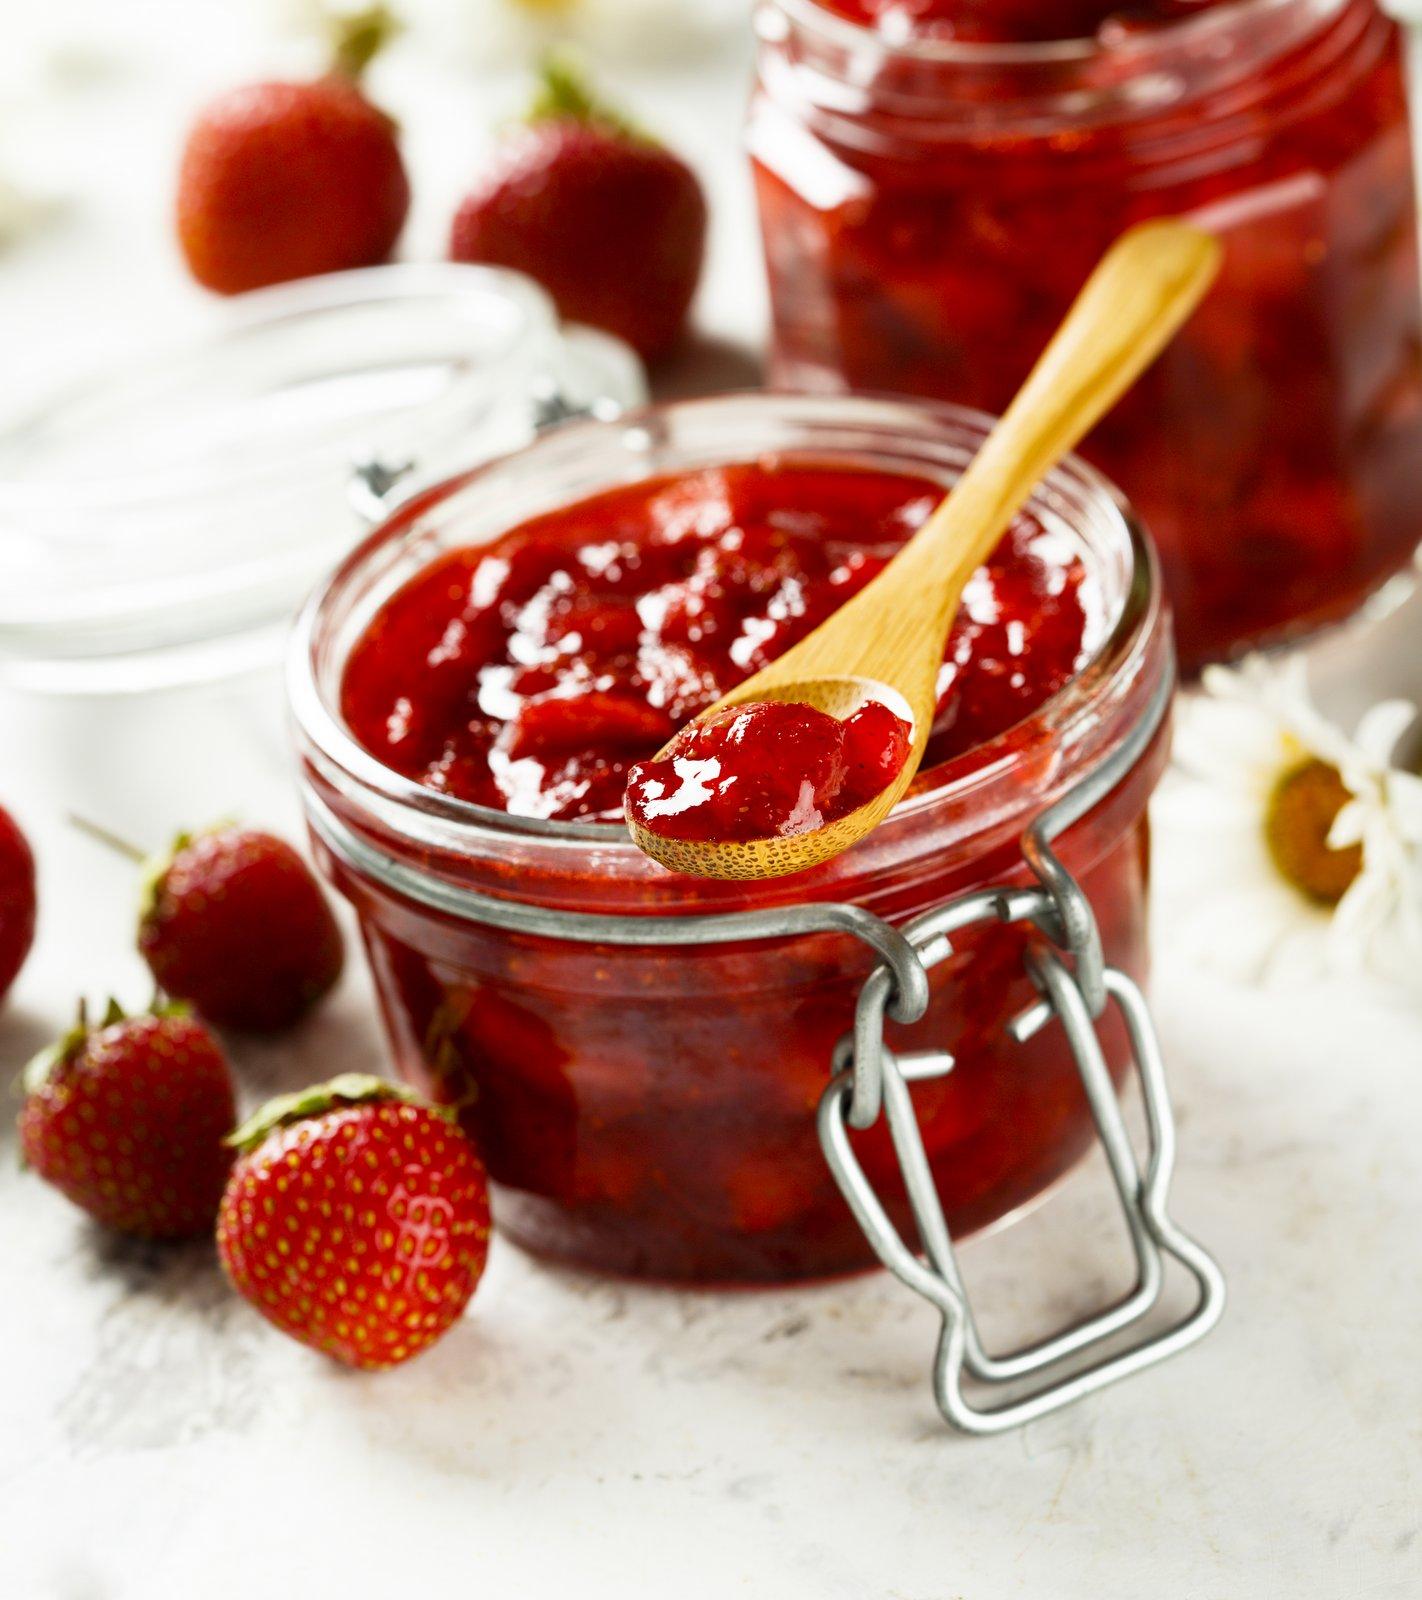 How to cook strawberry jam Recipes strawberry jam for the winter 64